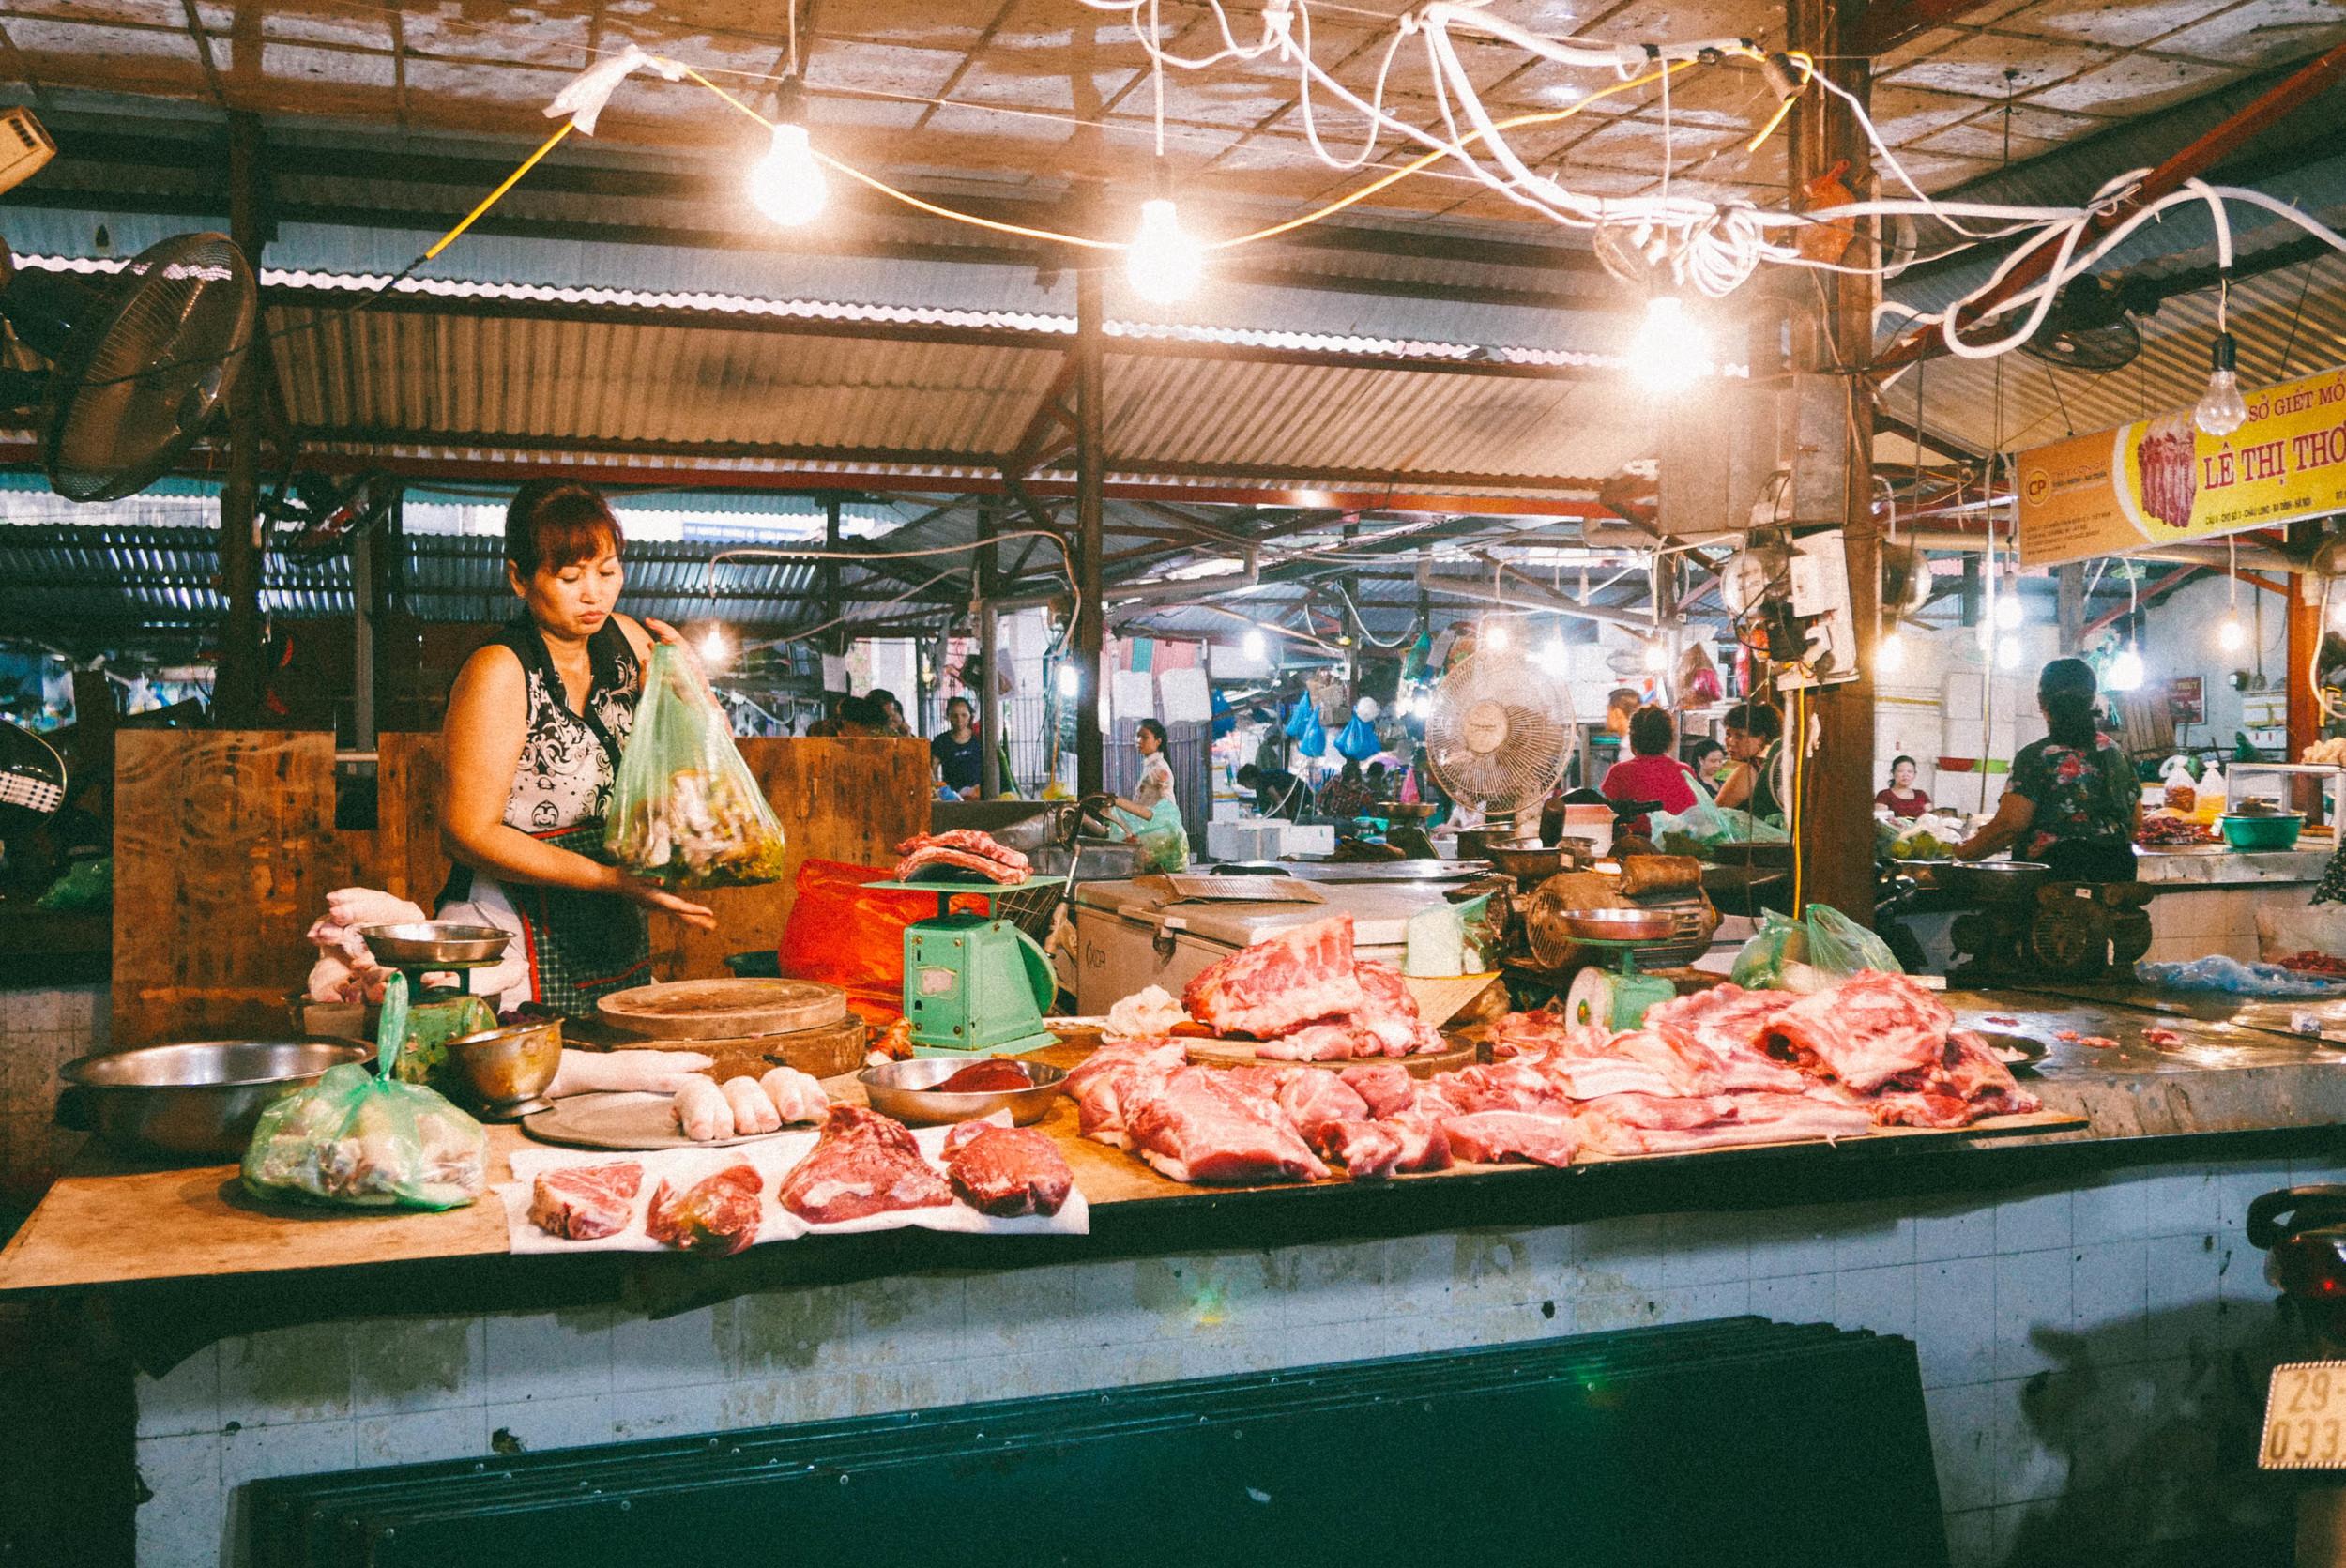 A meat vendor at the market.